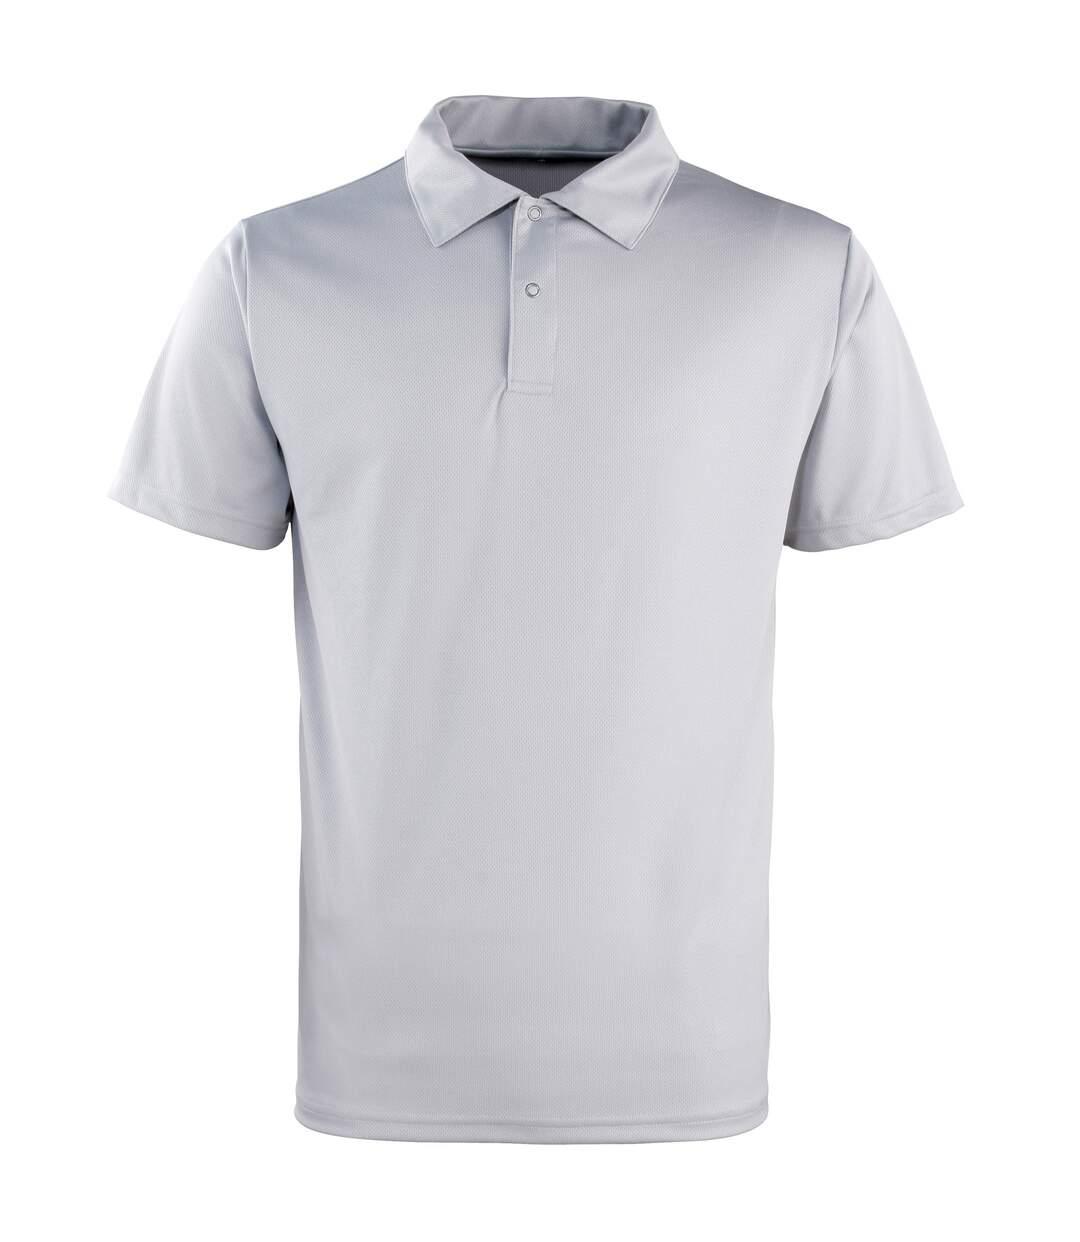 Premier Unisex Coolchecker Studded Plain Polo Shirt (Turquoise) - UTRW1110